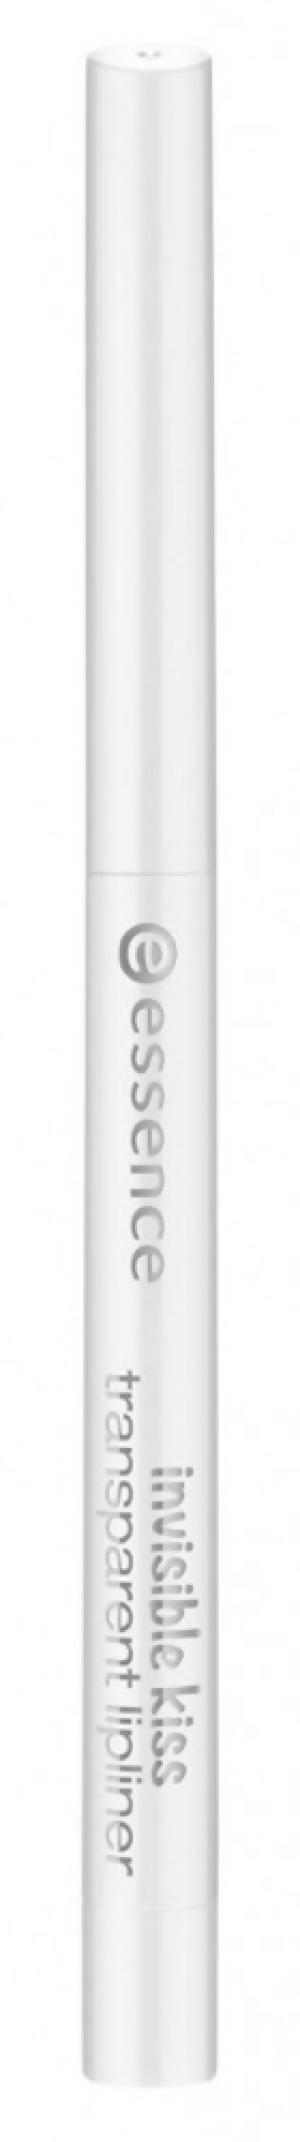 Карандаш для губ essence 01 Multitalent Wonder. Цвет: 01 multitalent wonder